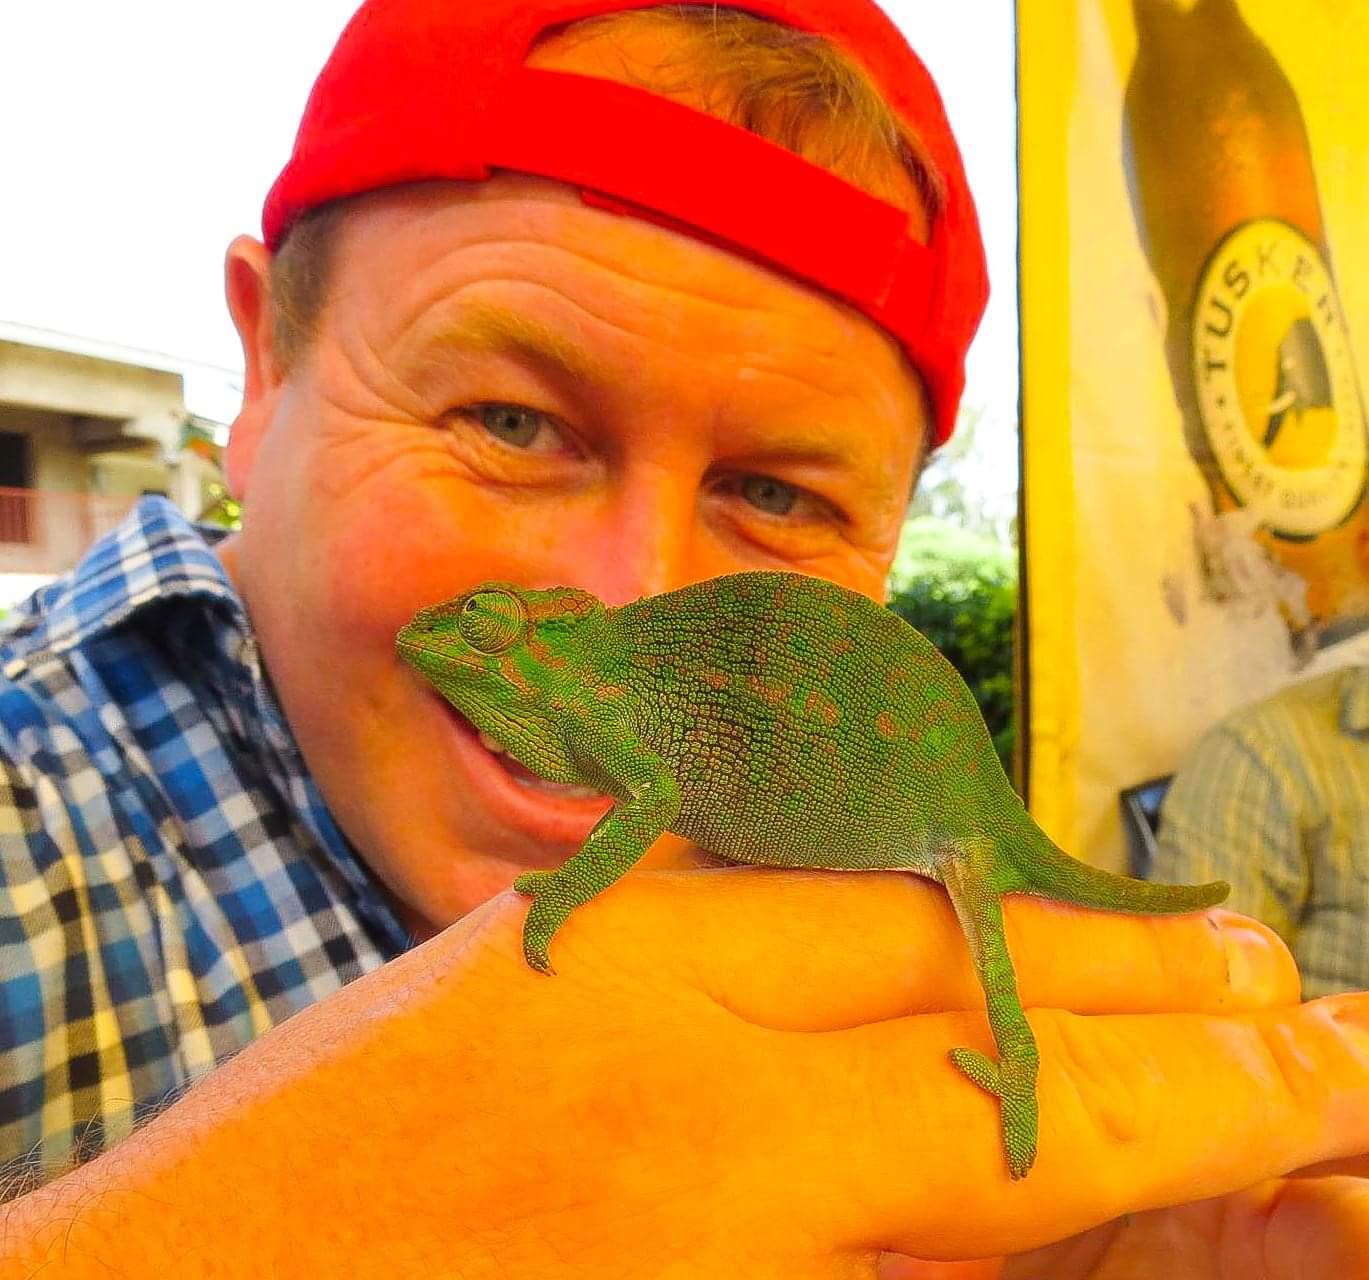 Arusha, Tanzania. My little Chameleon friend